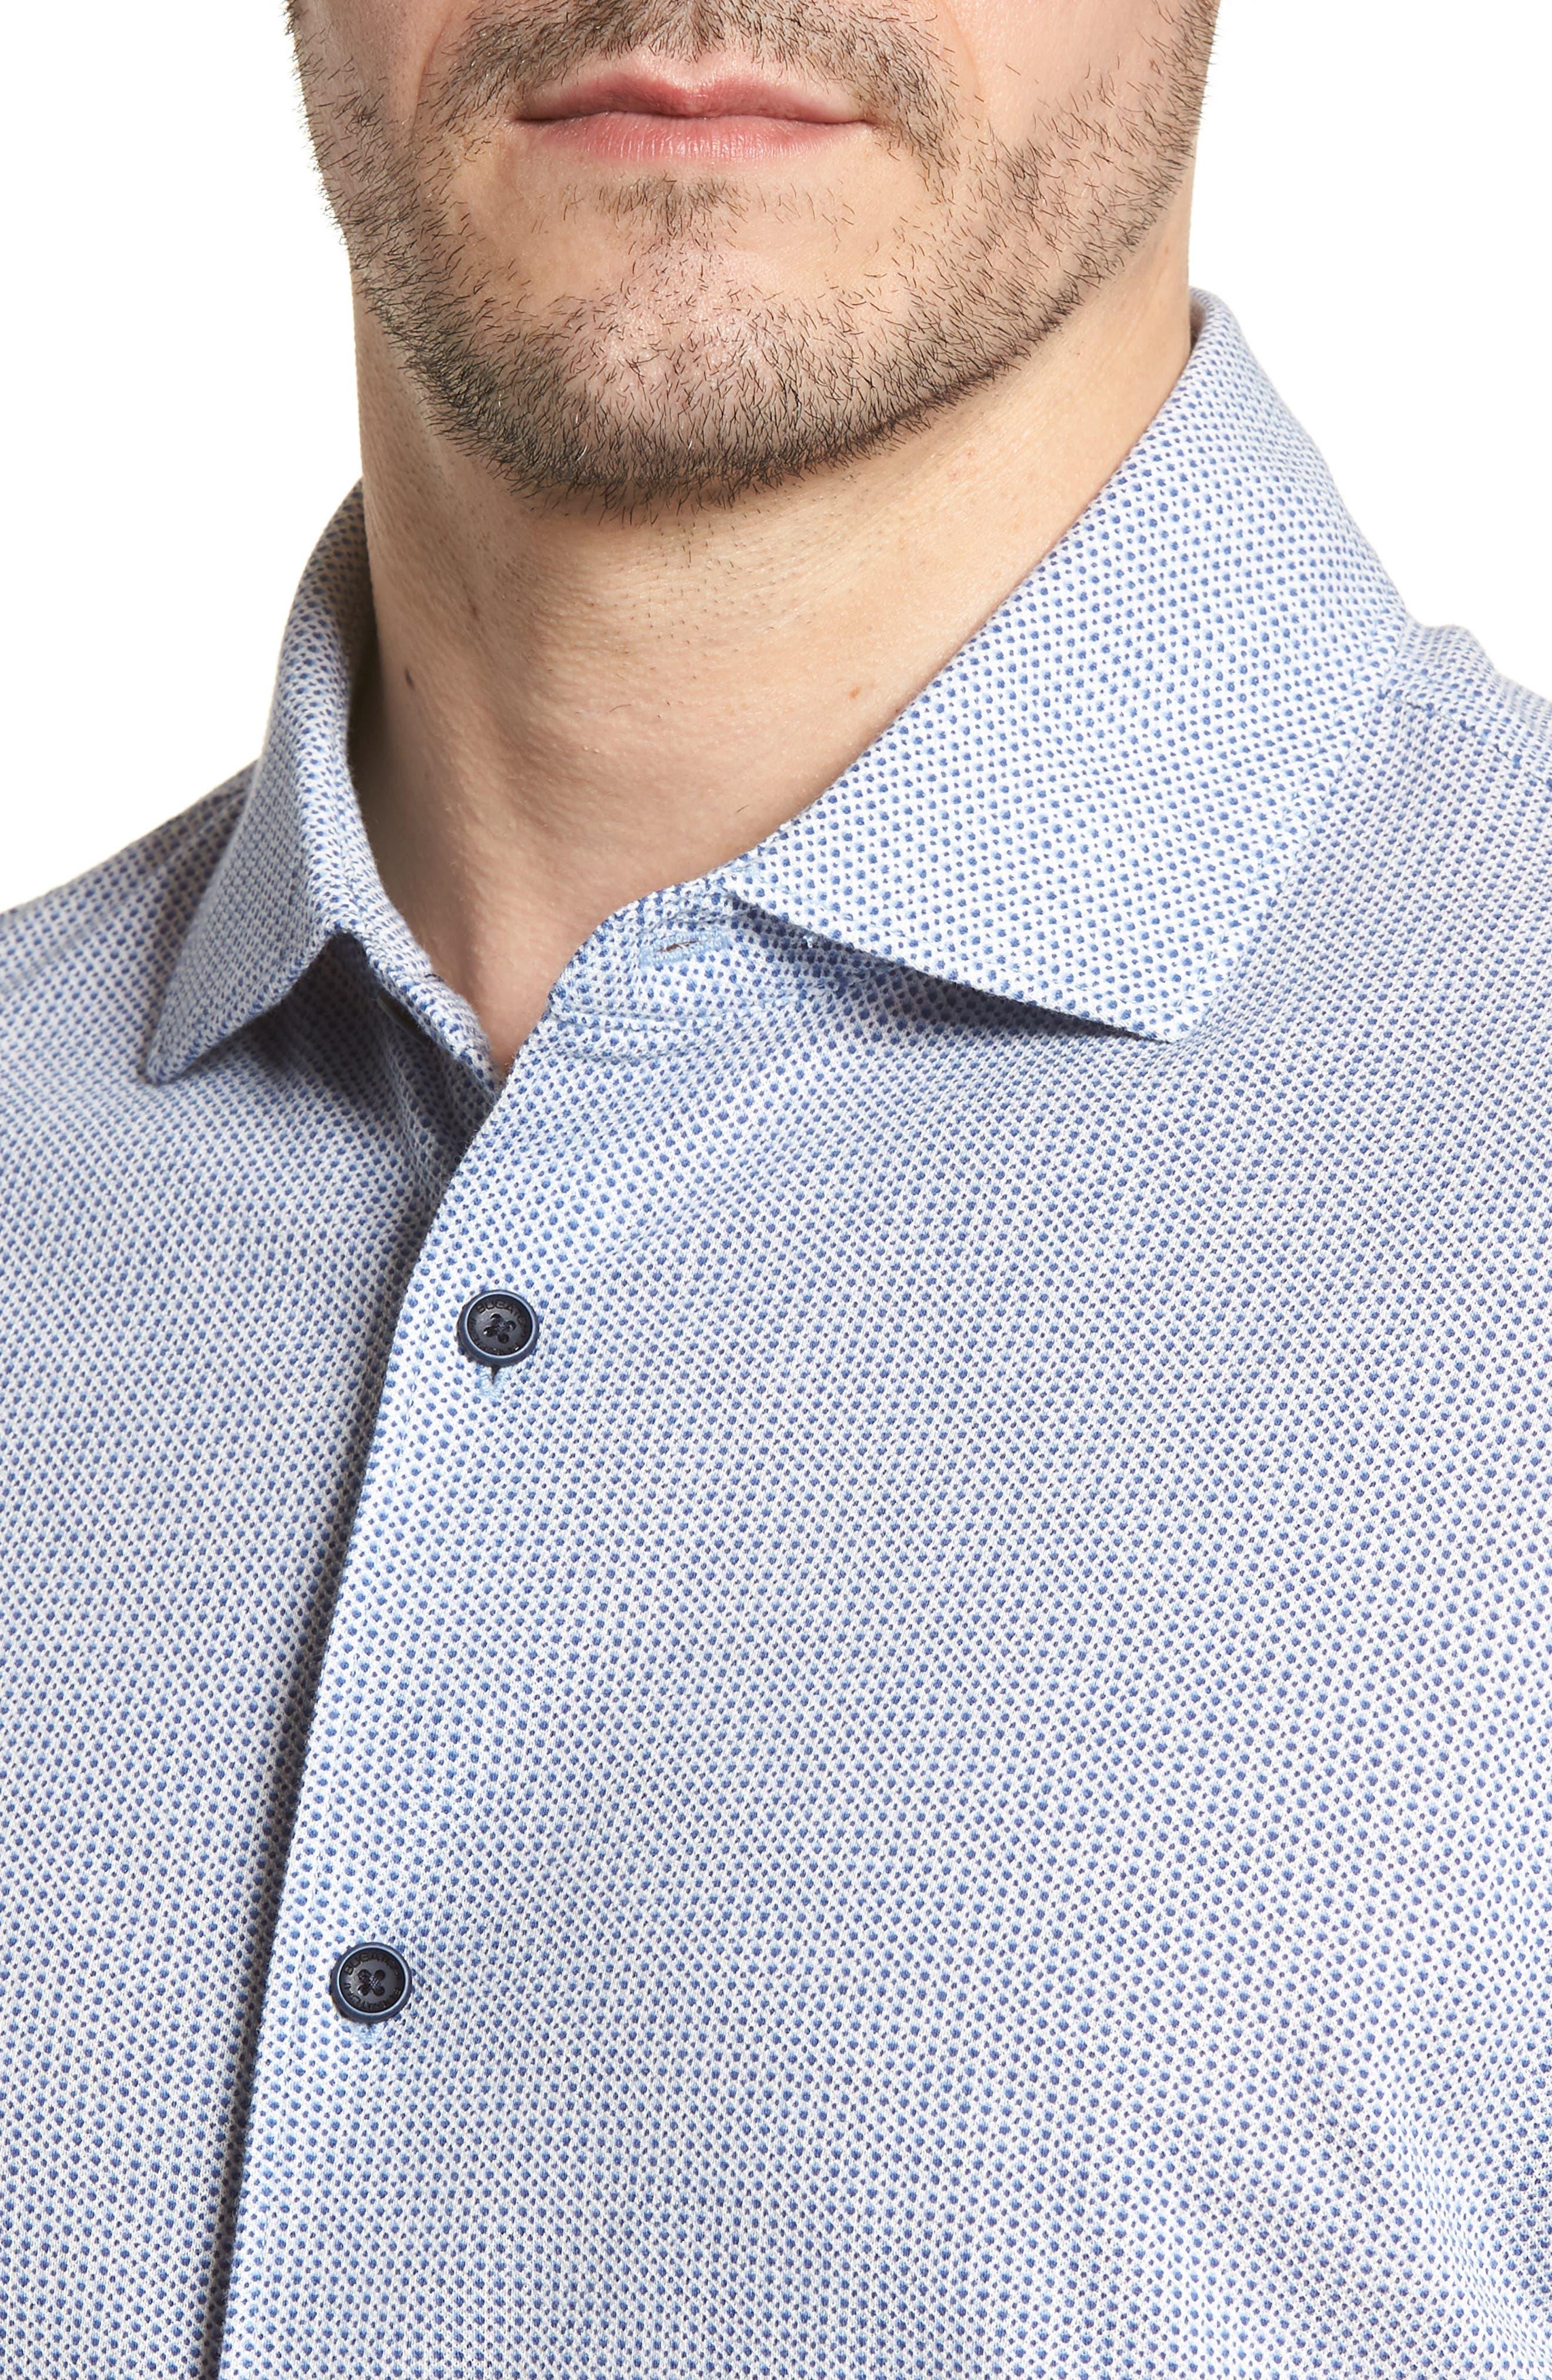 Regular Fit Microprint Sport Shirt,                             Alternate thumbnail 4, color,                             Classic Blue